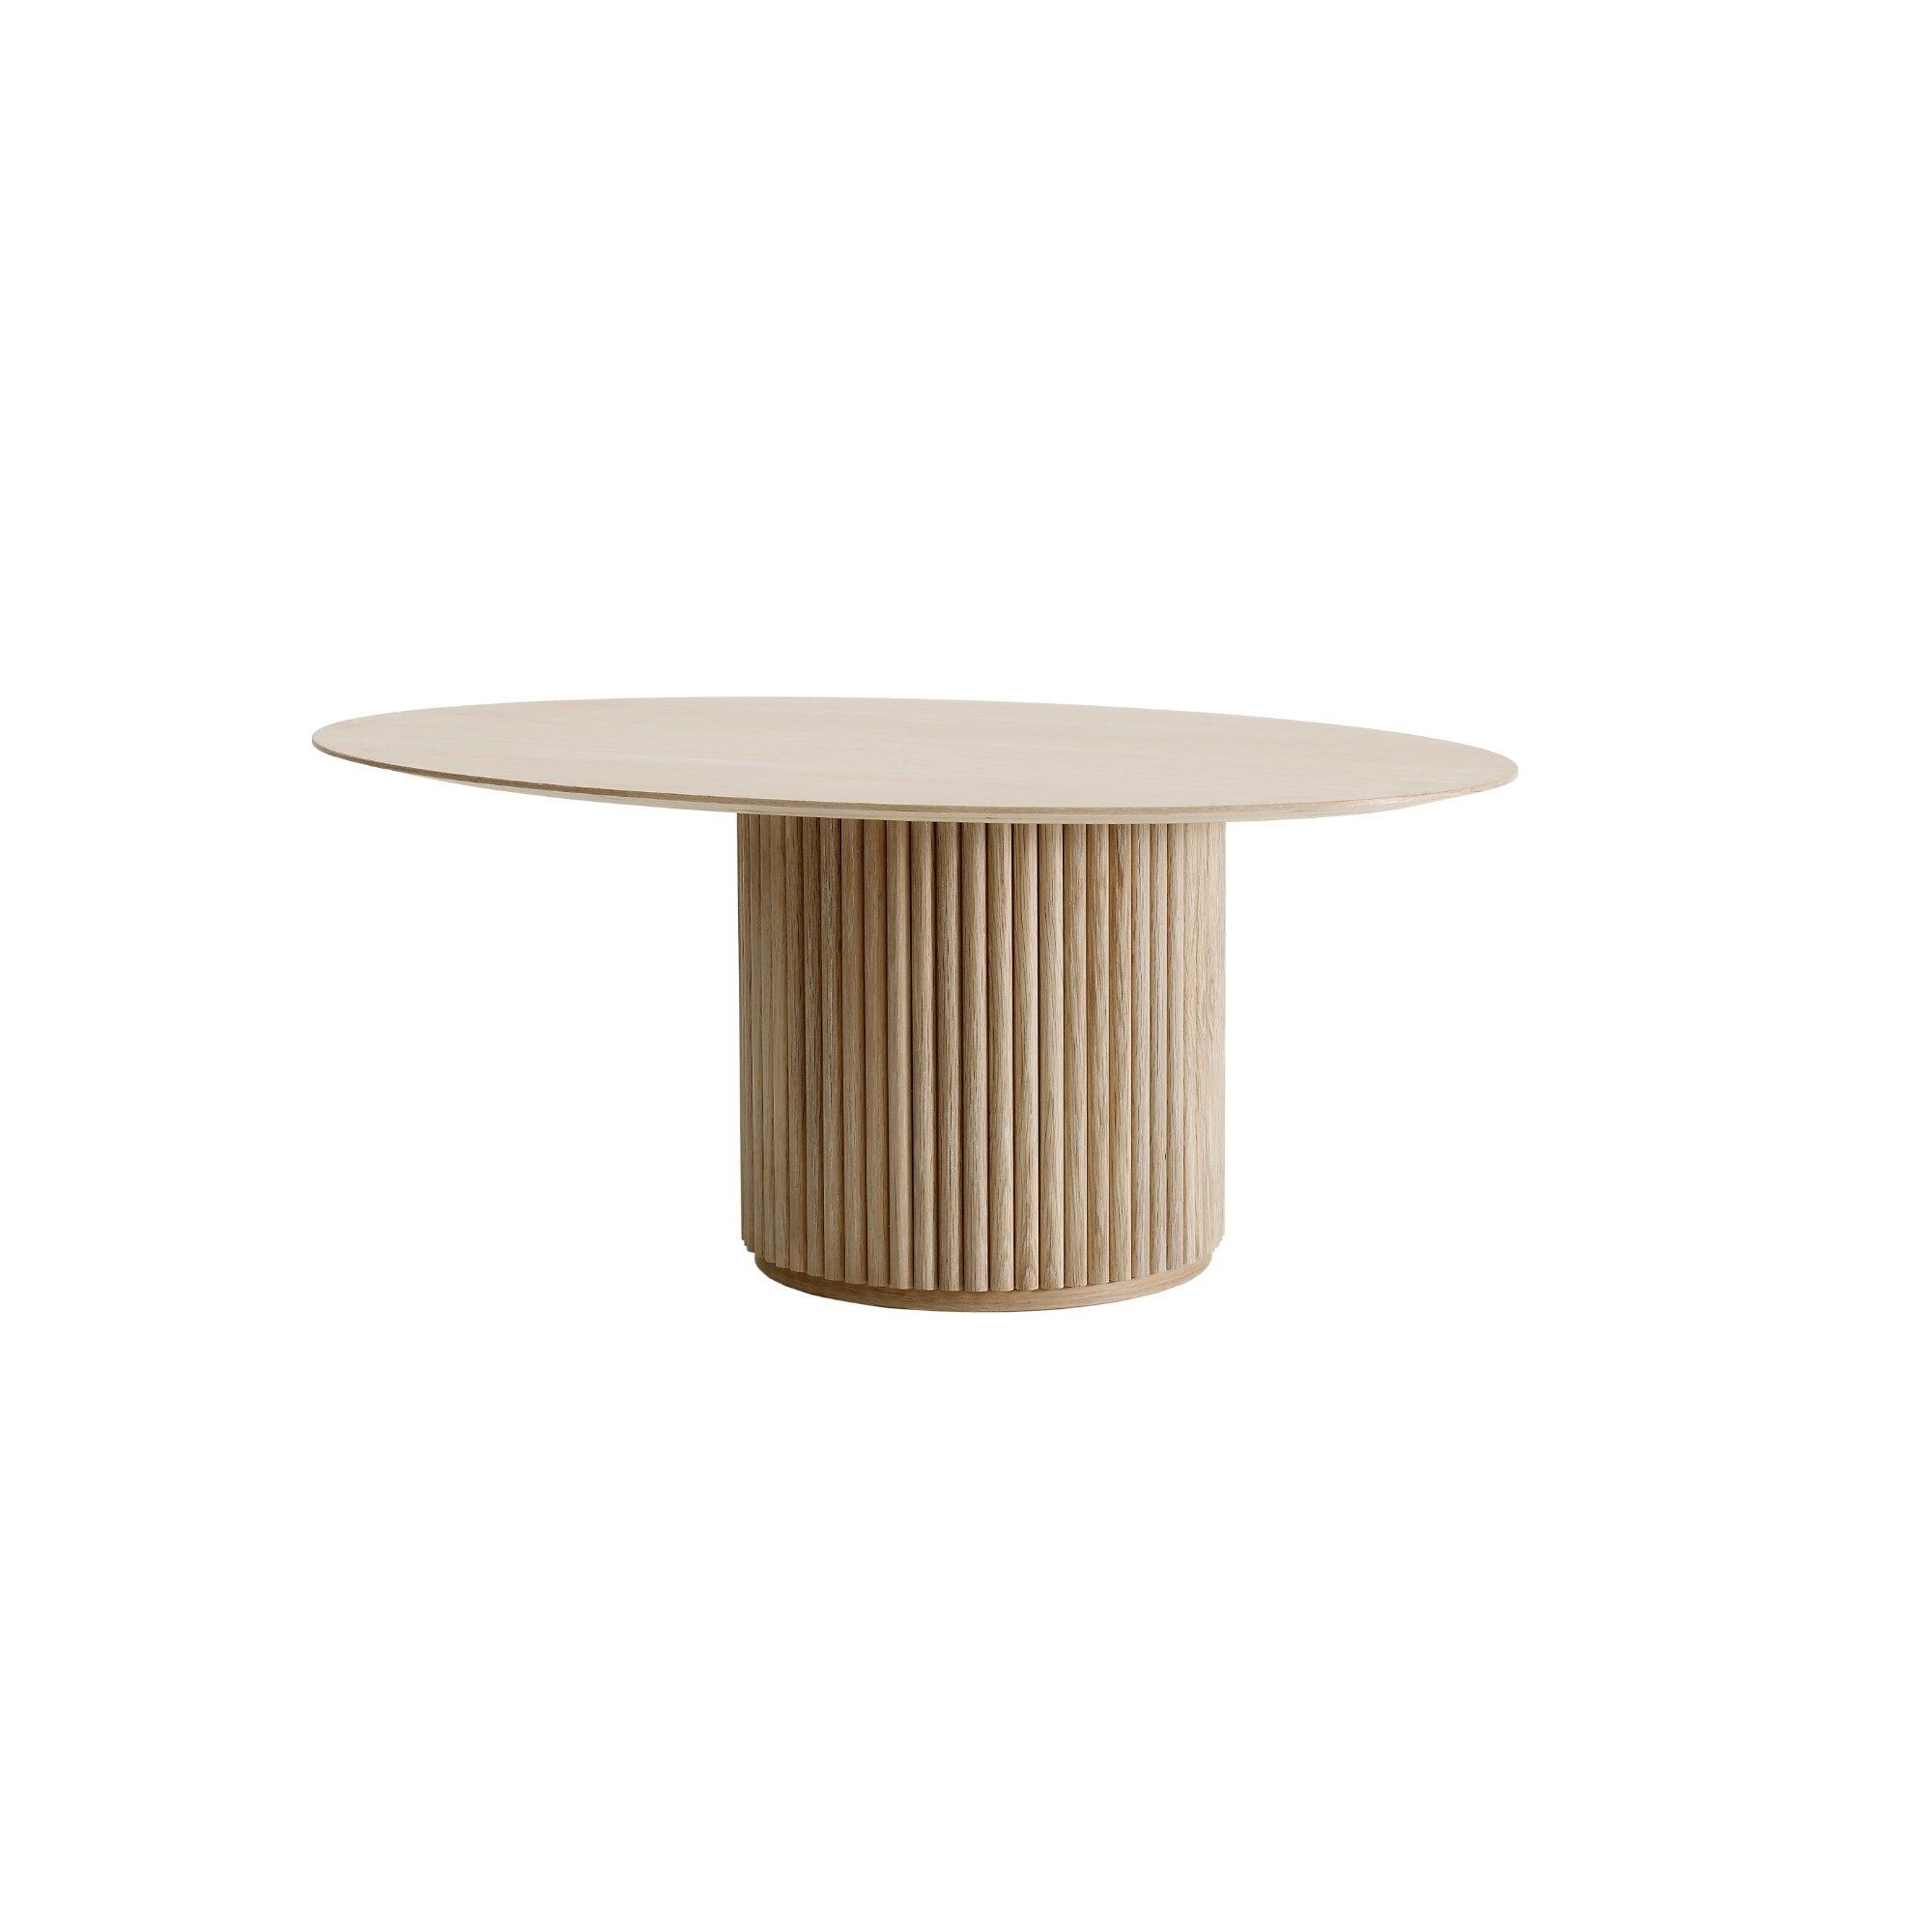 Palais Ovale Coffee Table Oval Wood Coffee Table Round Glass Coffee Table Scandinavian Coffee Table [ 2000 x 2000 Pixel ]